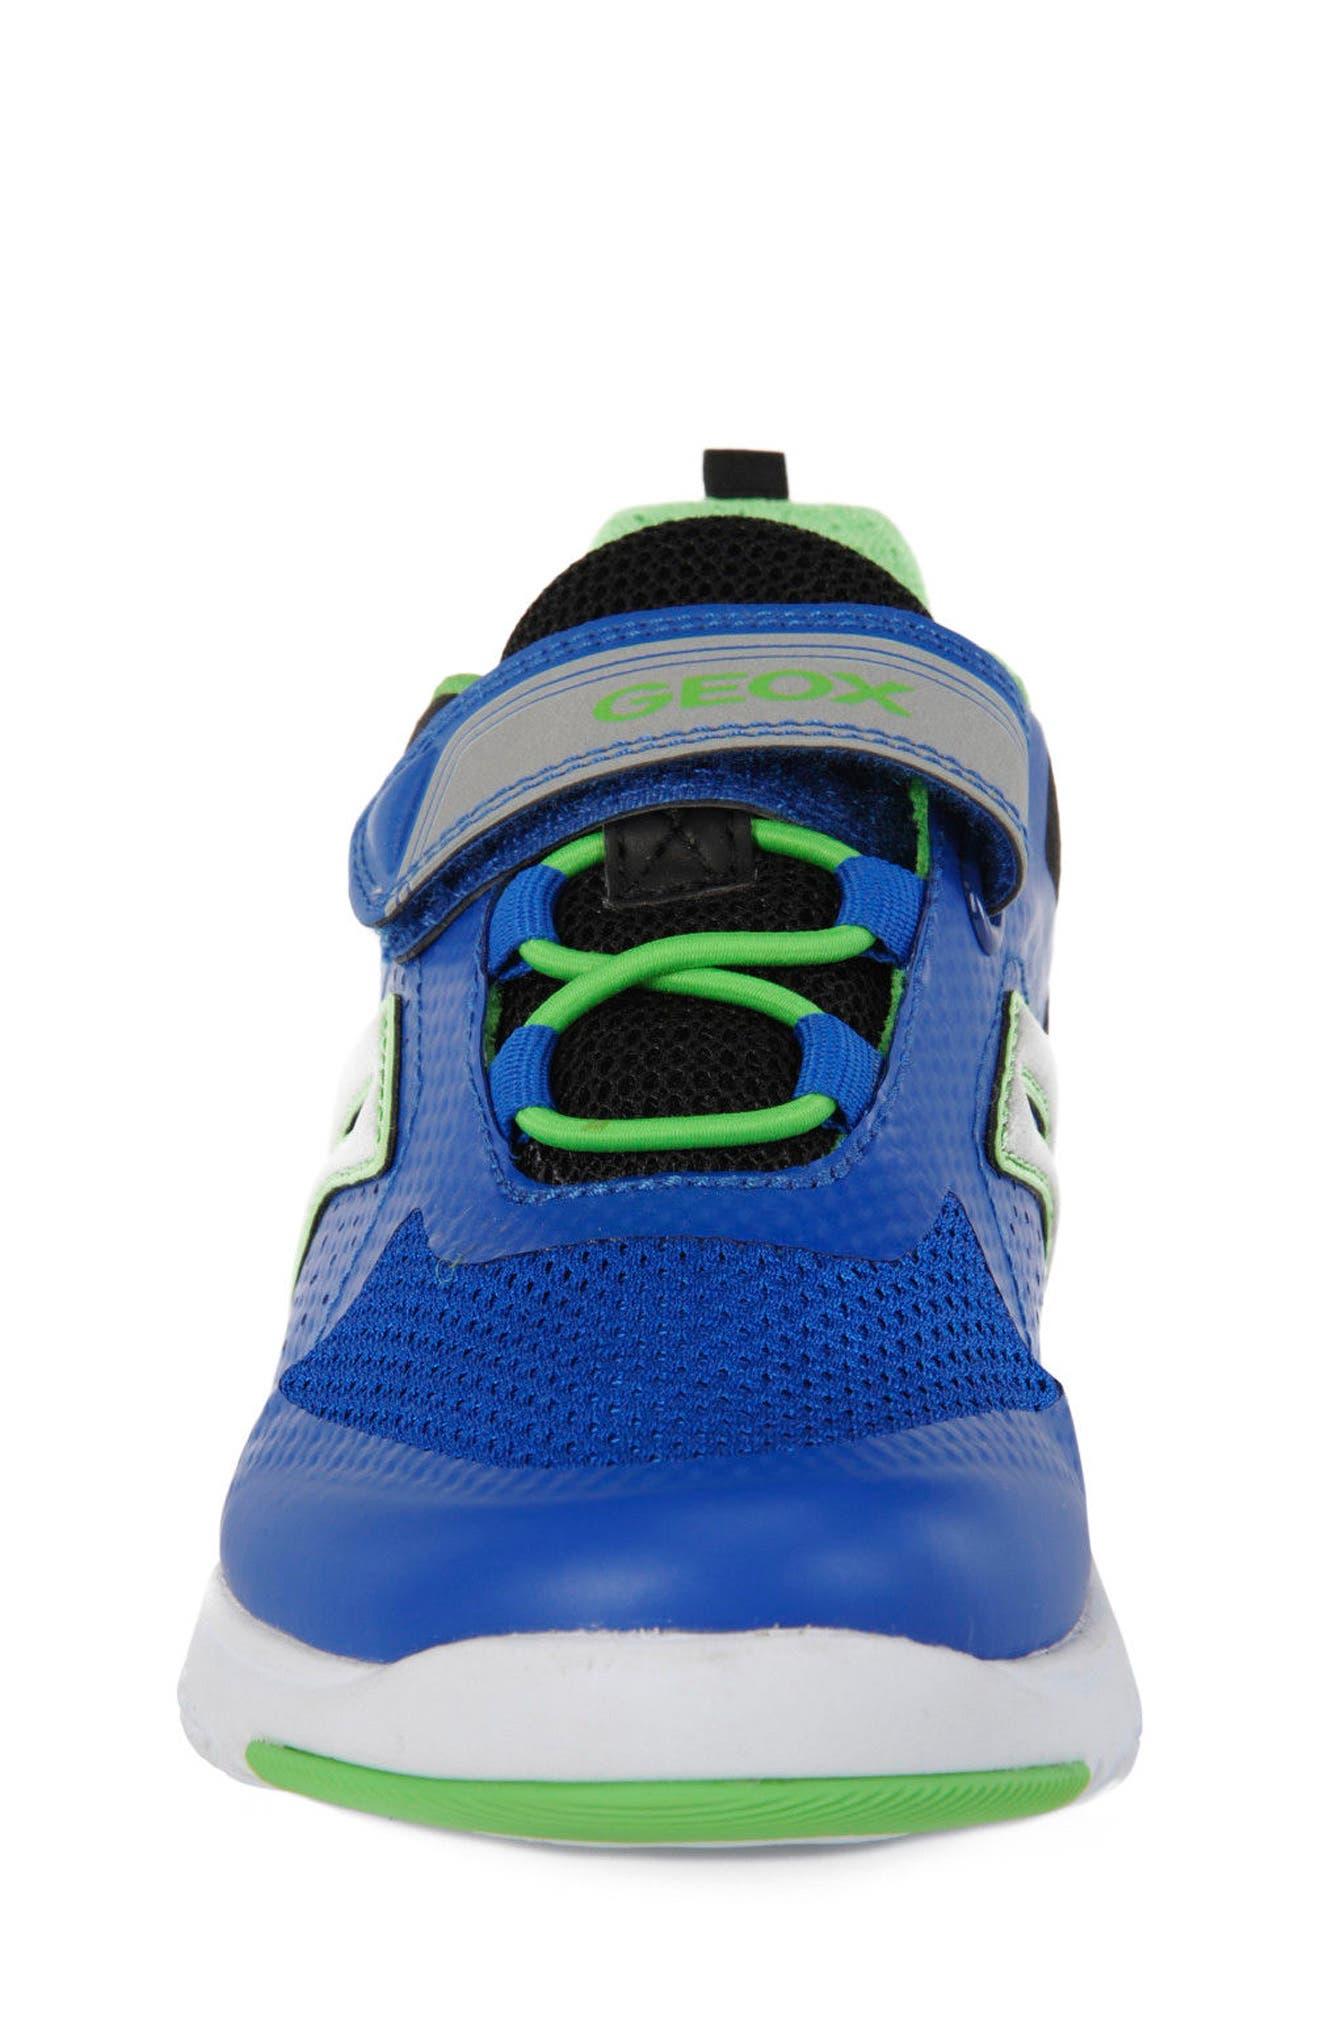 Alternate Image 4  - Geox Xunday Low Top Sneaker (Toddler, Little Kid & Big Kid)